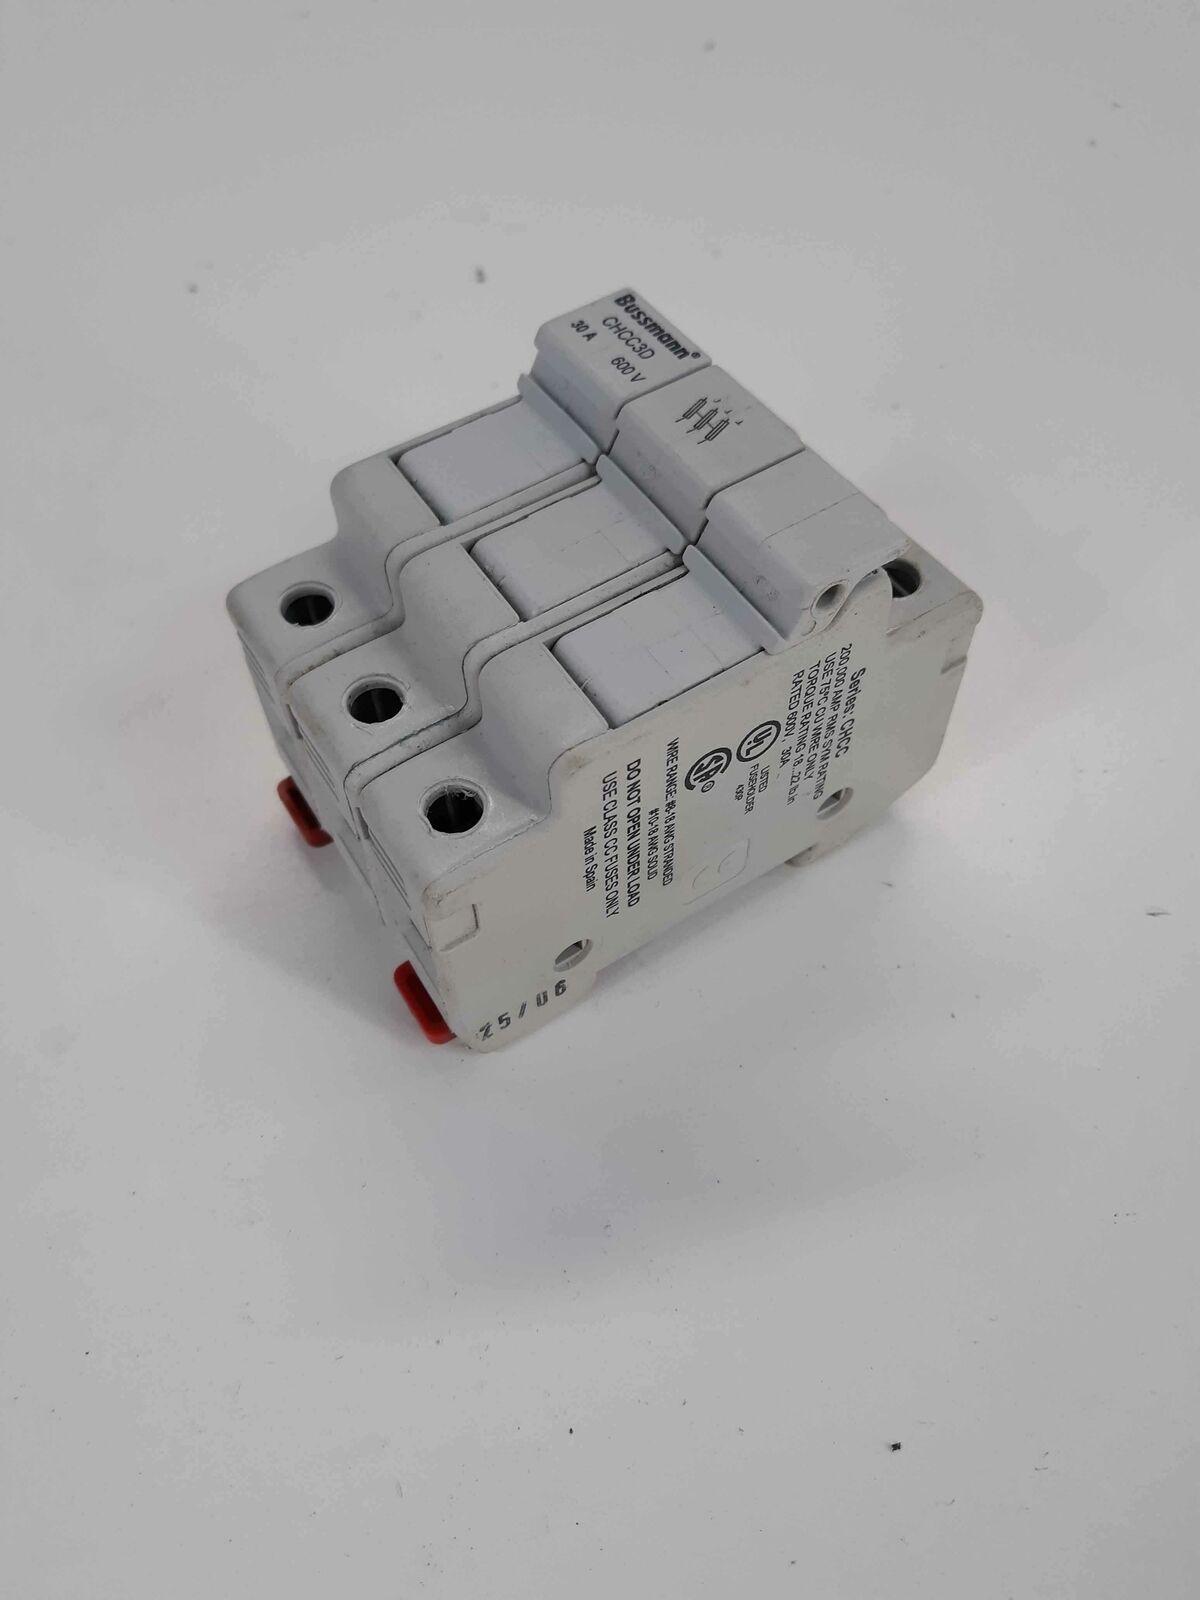 GOULD Ultrasafe 30A   600V    1 Pole Breaker  USM1I